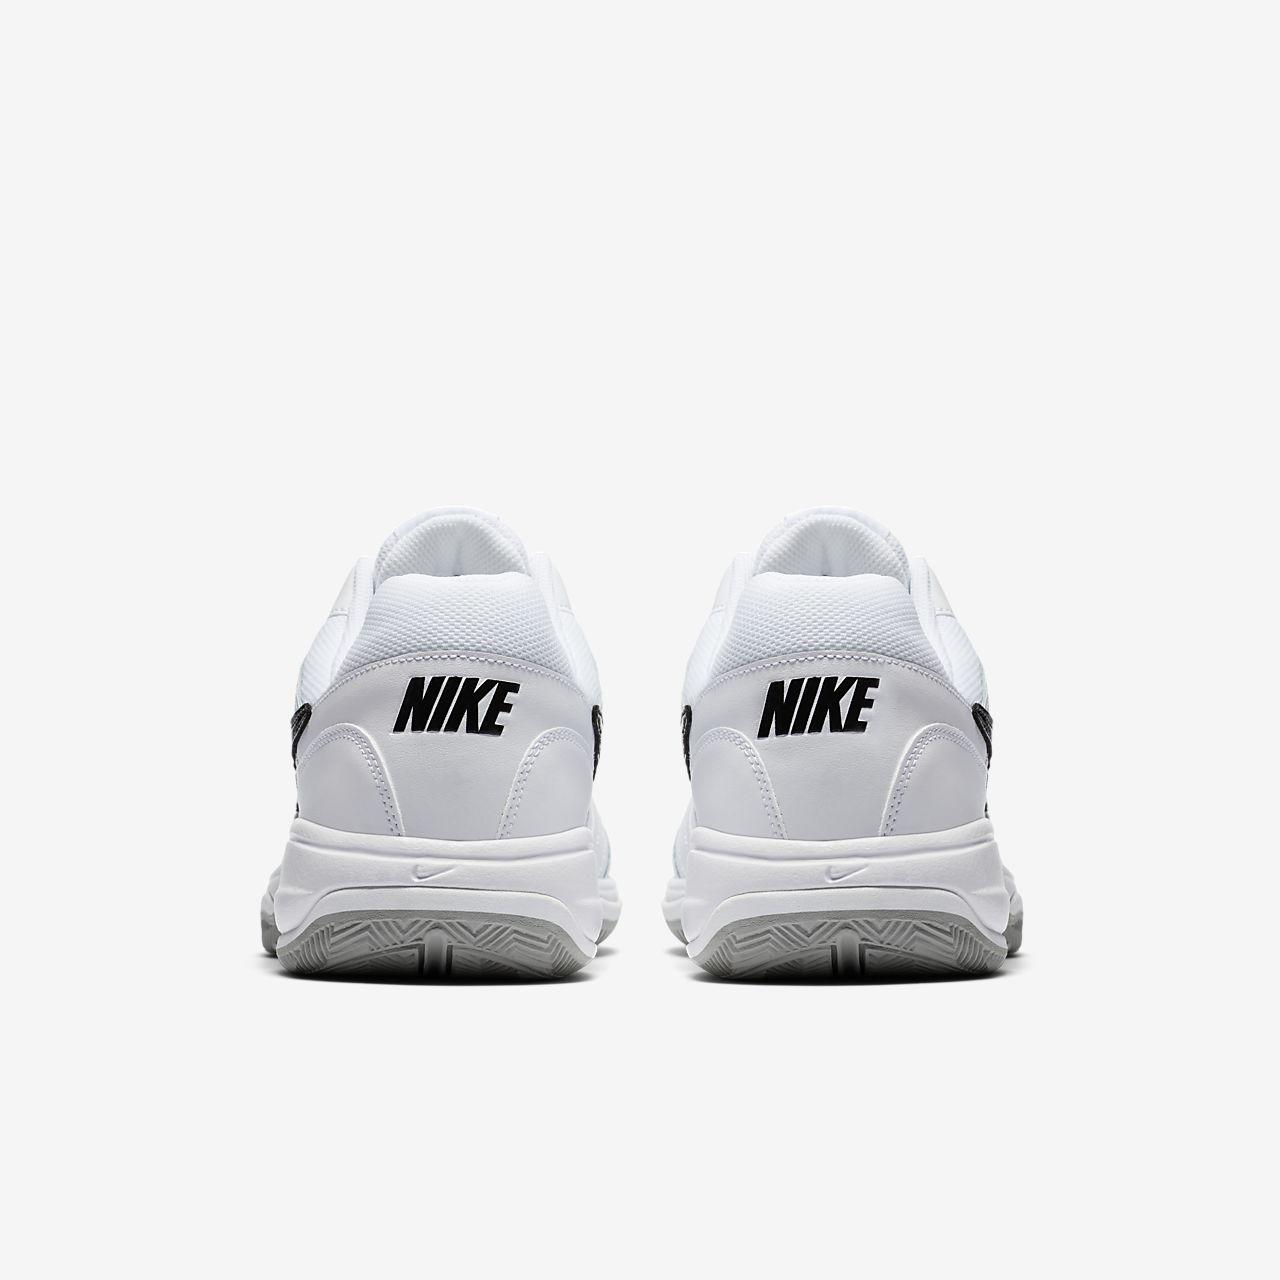 46068fbf99c NikeCourt Lite (Wide) Men s Tennis Shoe. Nike.com